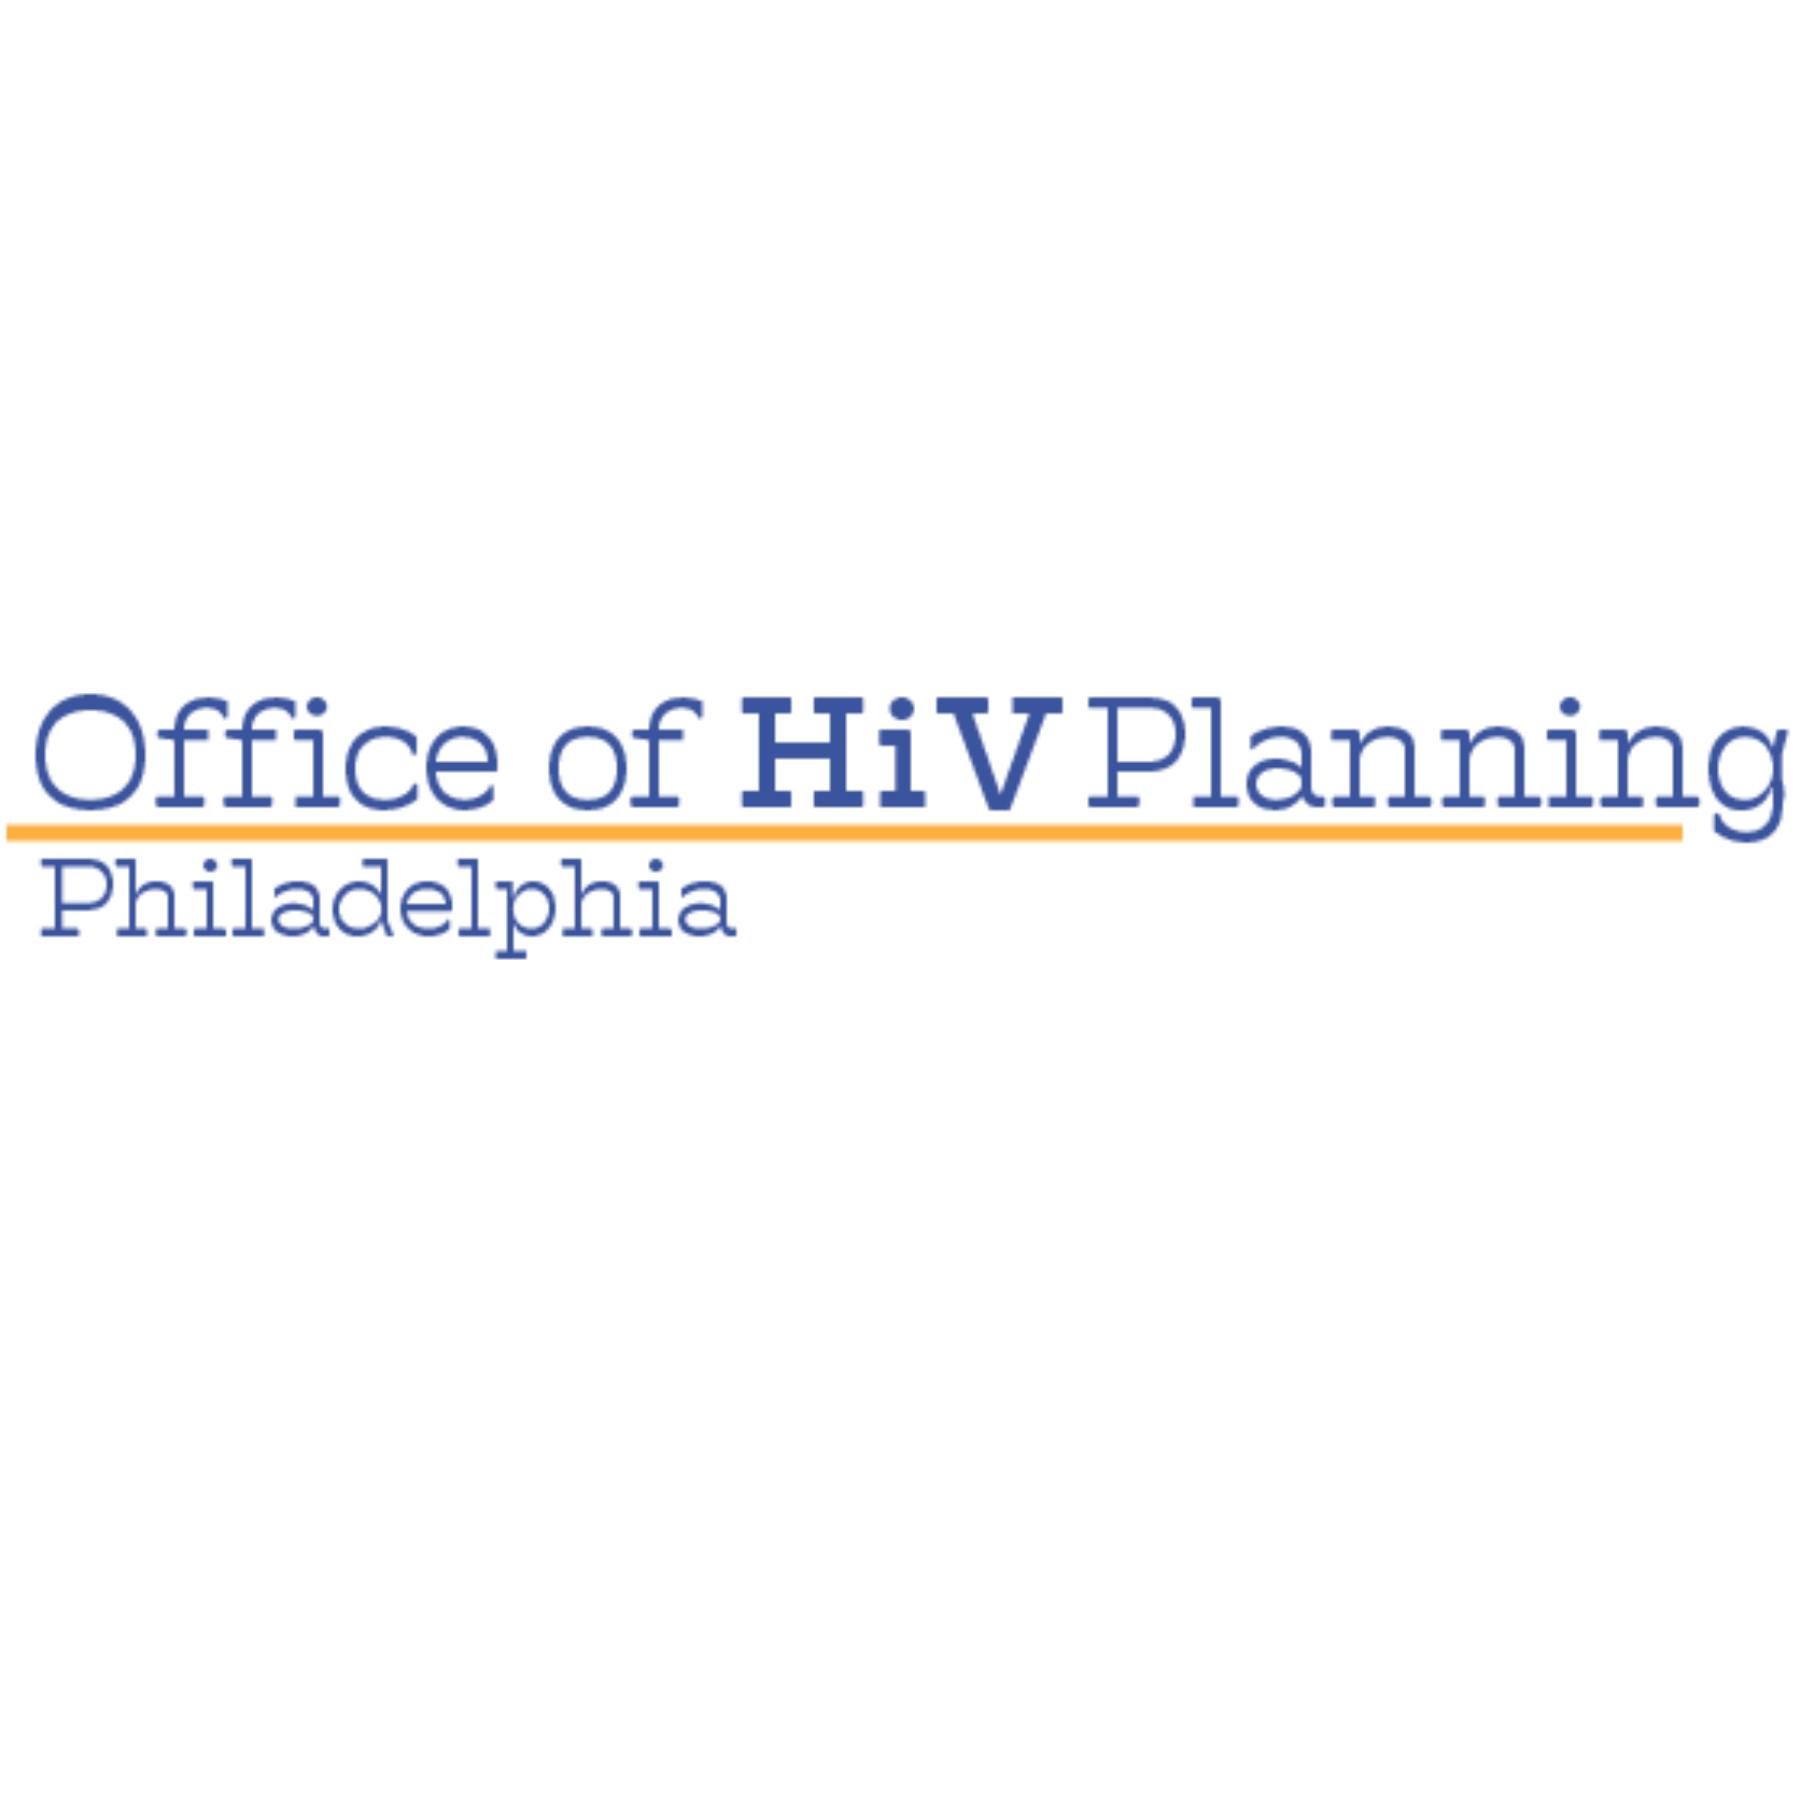 office of hiv planning logo